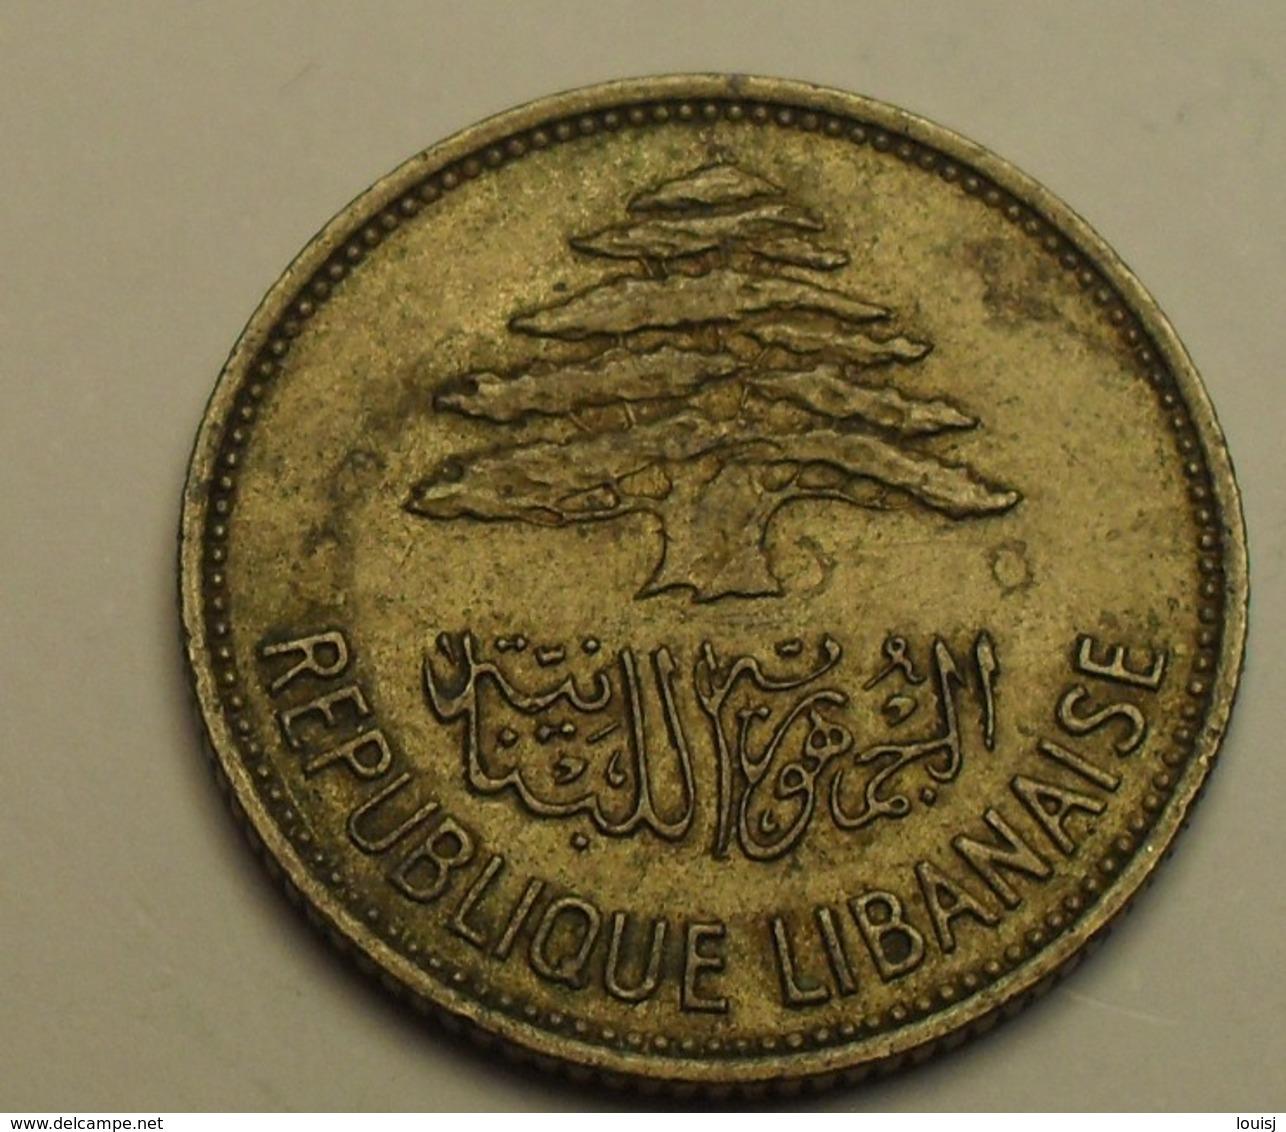 1961 - Liban - Lebanon - 25 PIASTRES - KM 16.2 - Liban